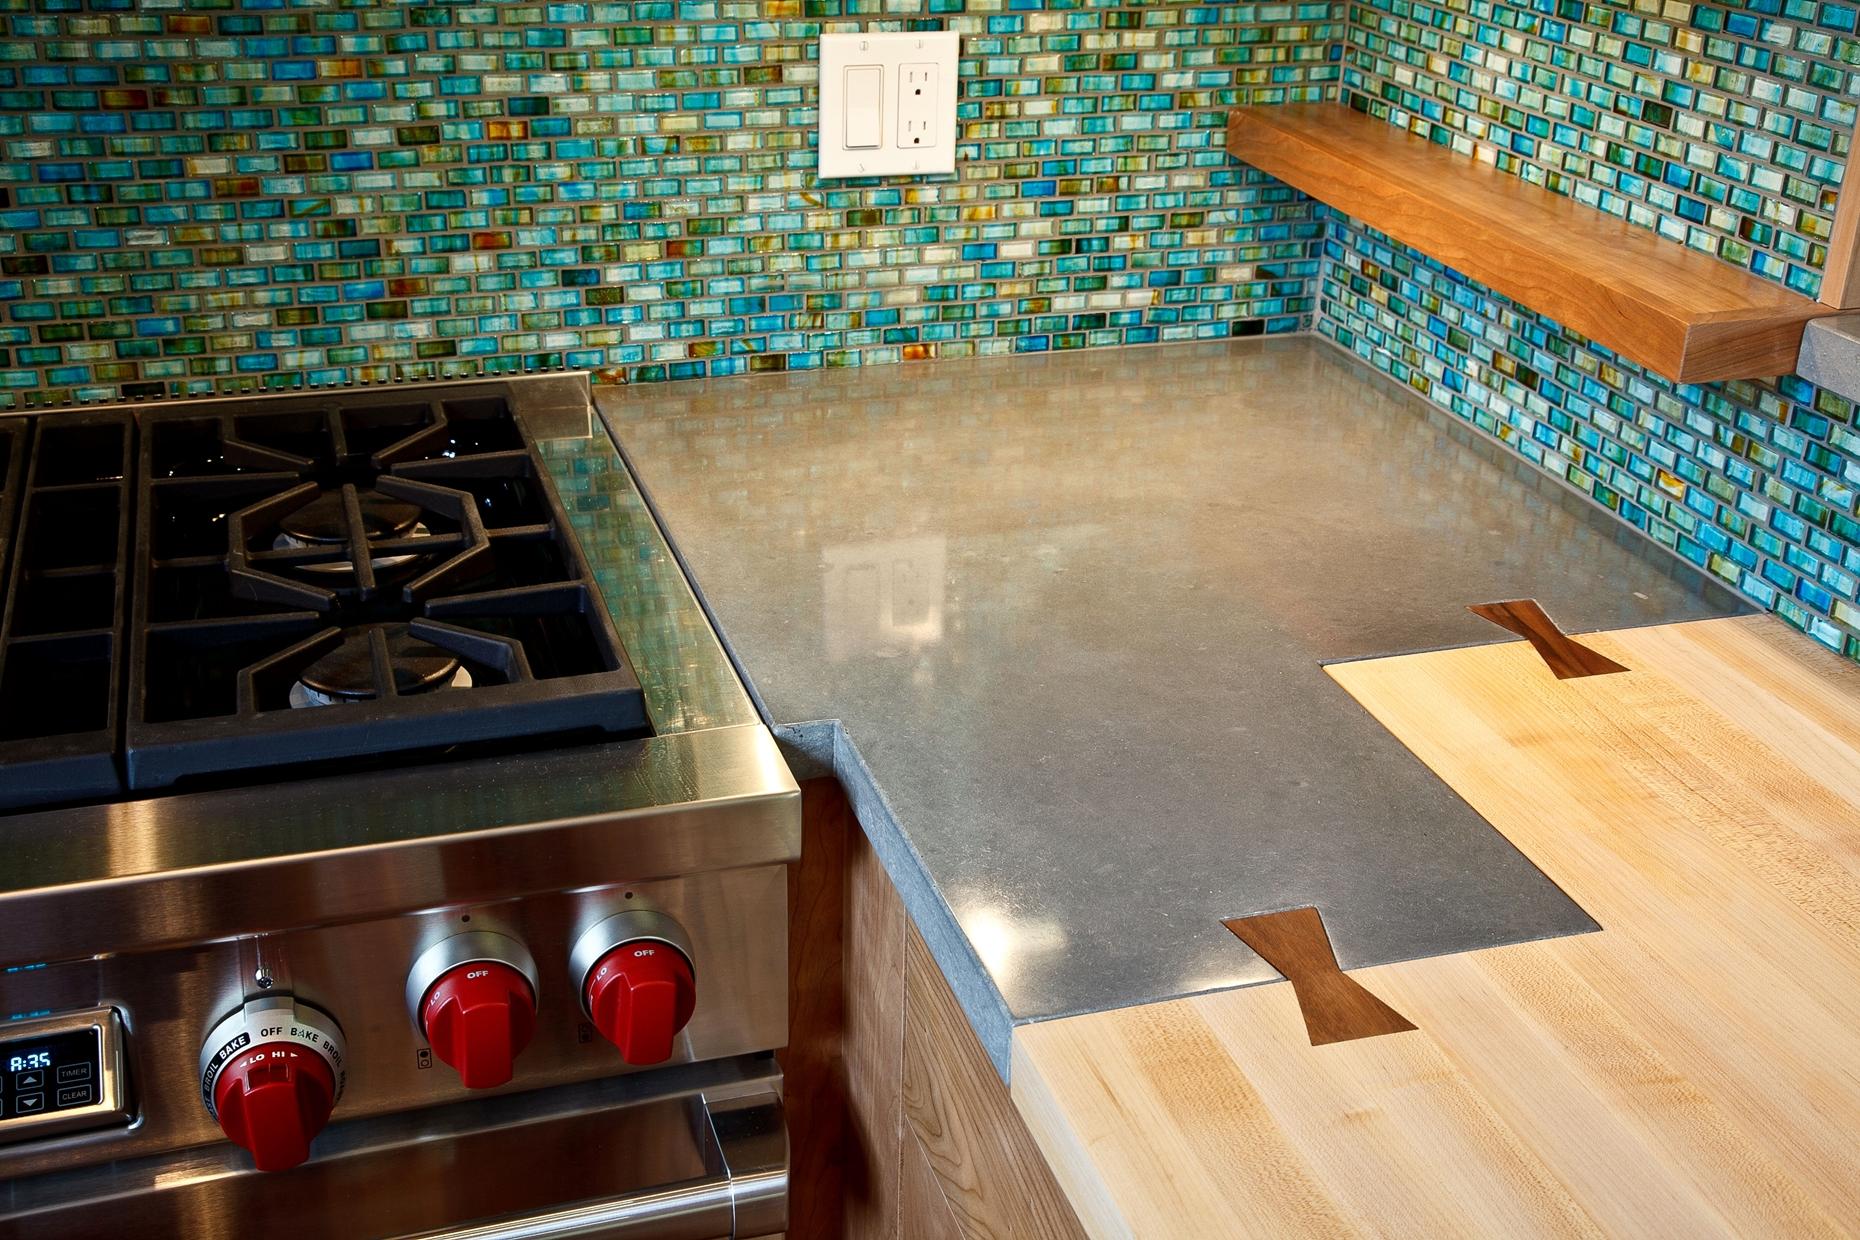 ECC Warm Grey Concrete Countertop with Inlaid Bowtie Seam Detail.jpg